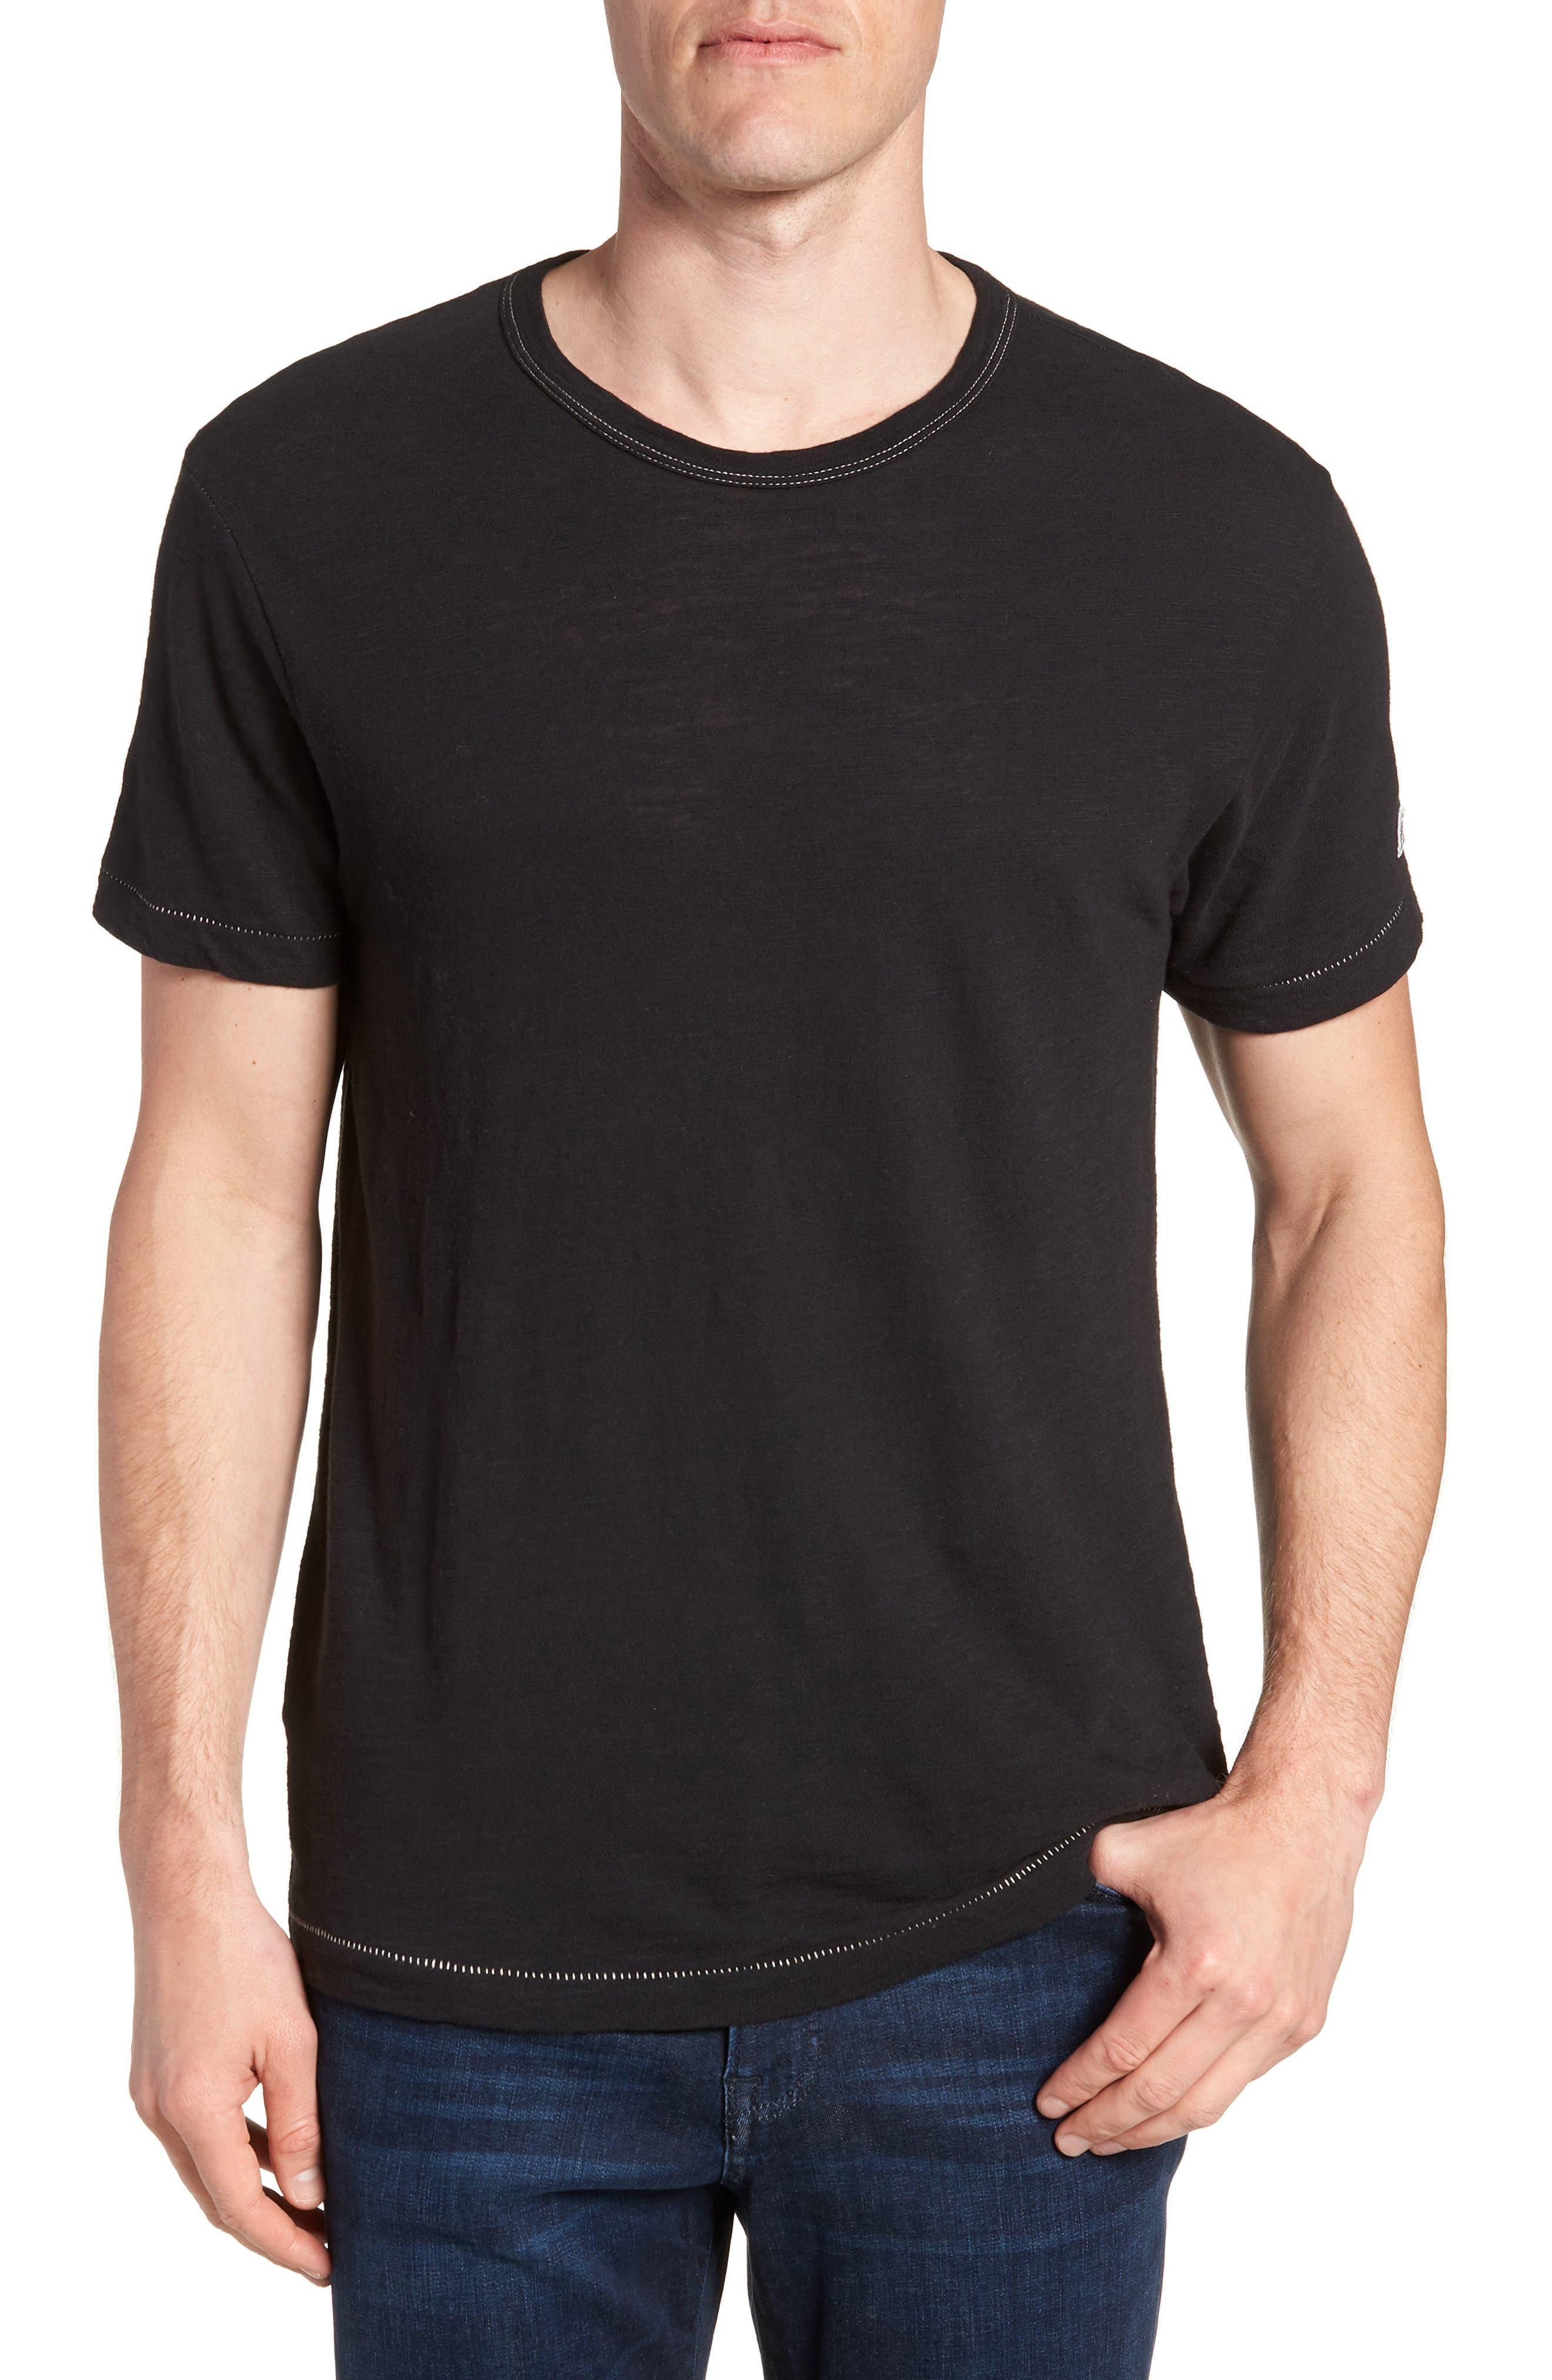 Todd Snyder + Champion T-Shirt